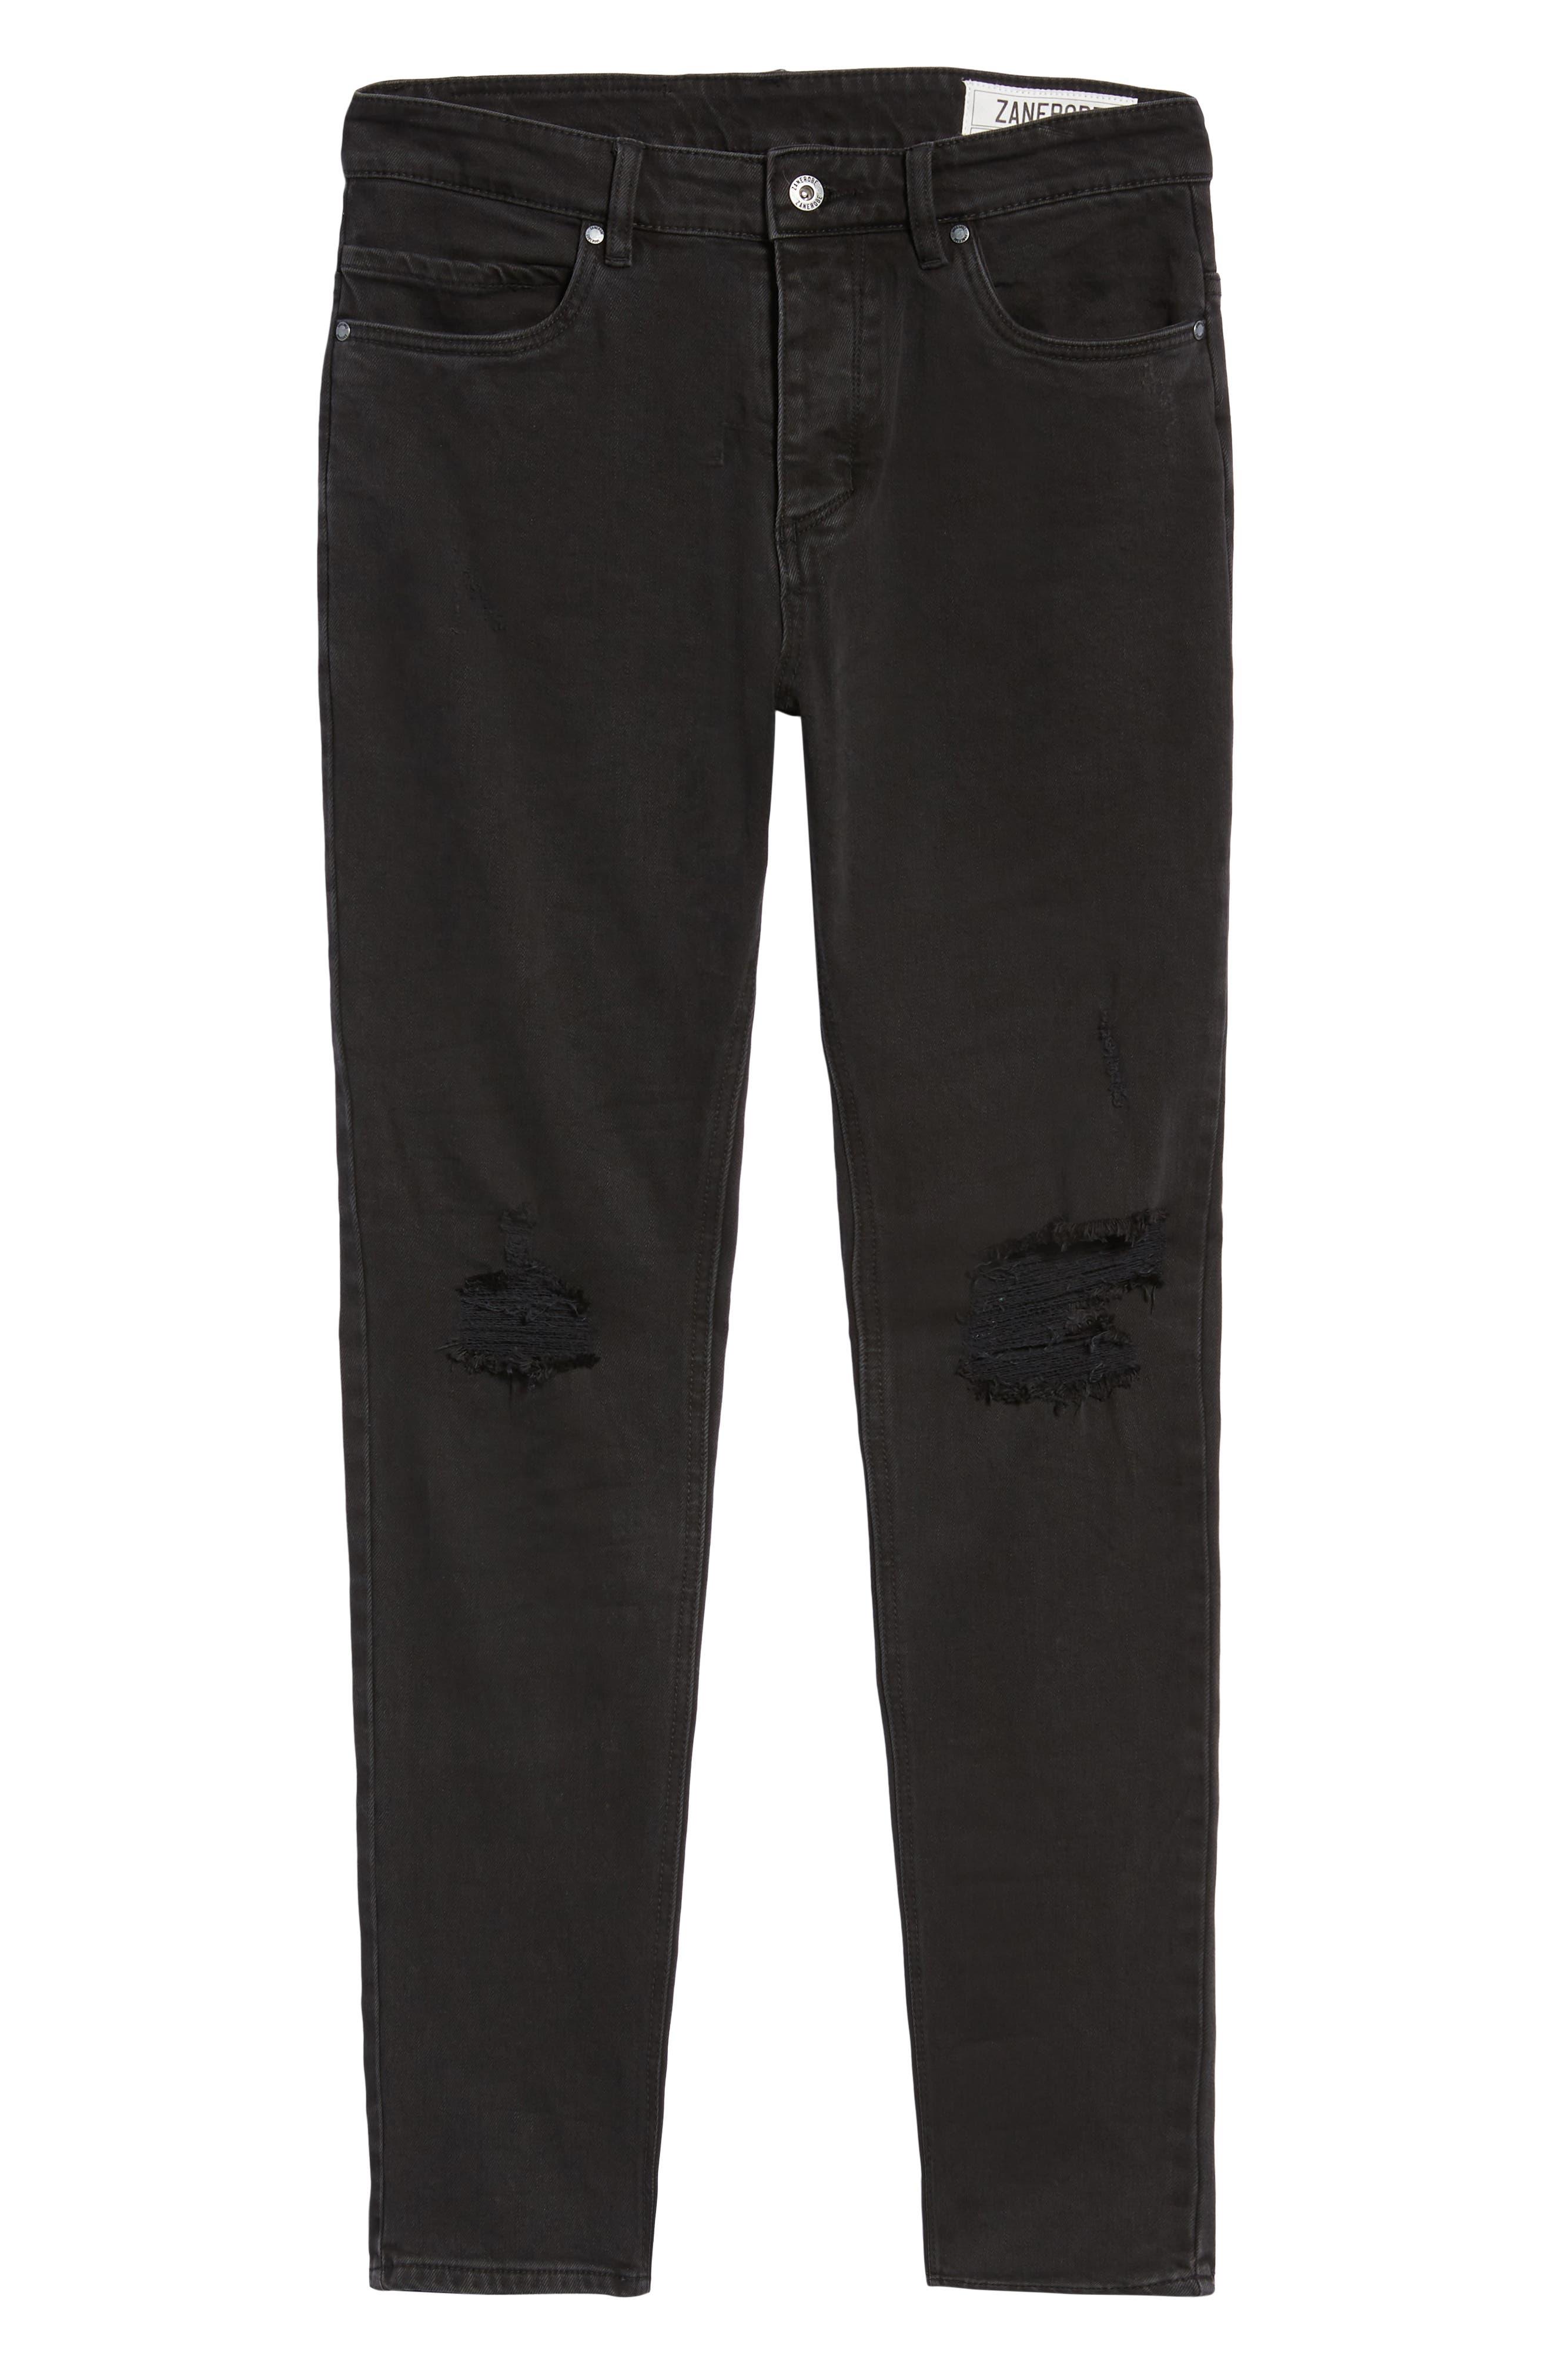 Joe Blow Slim Fit Jeans,                             Alternate thumbnail 6, color,                             BUSTED BLACK